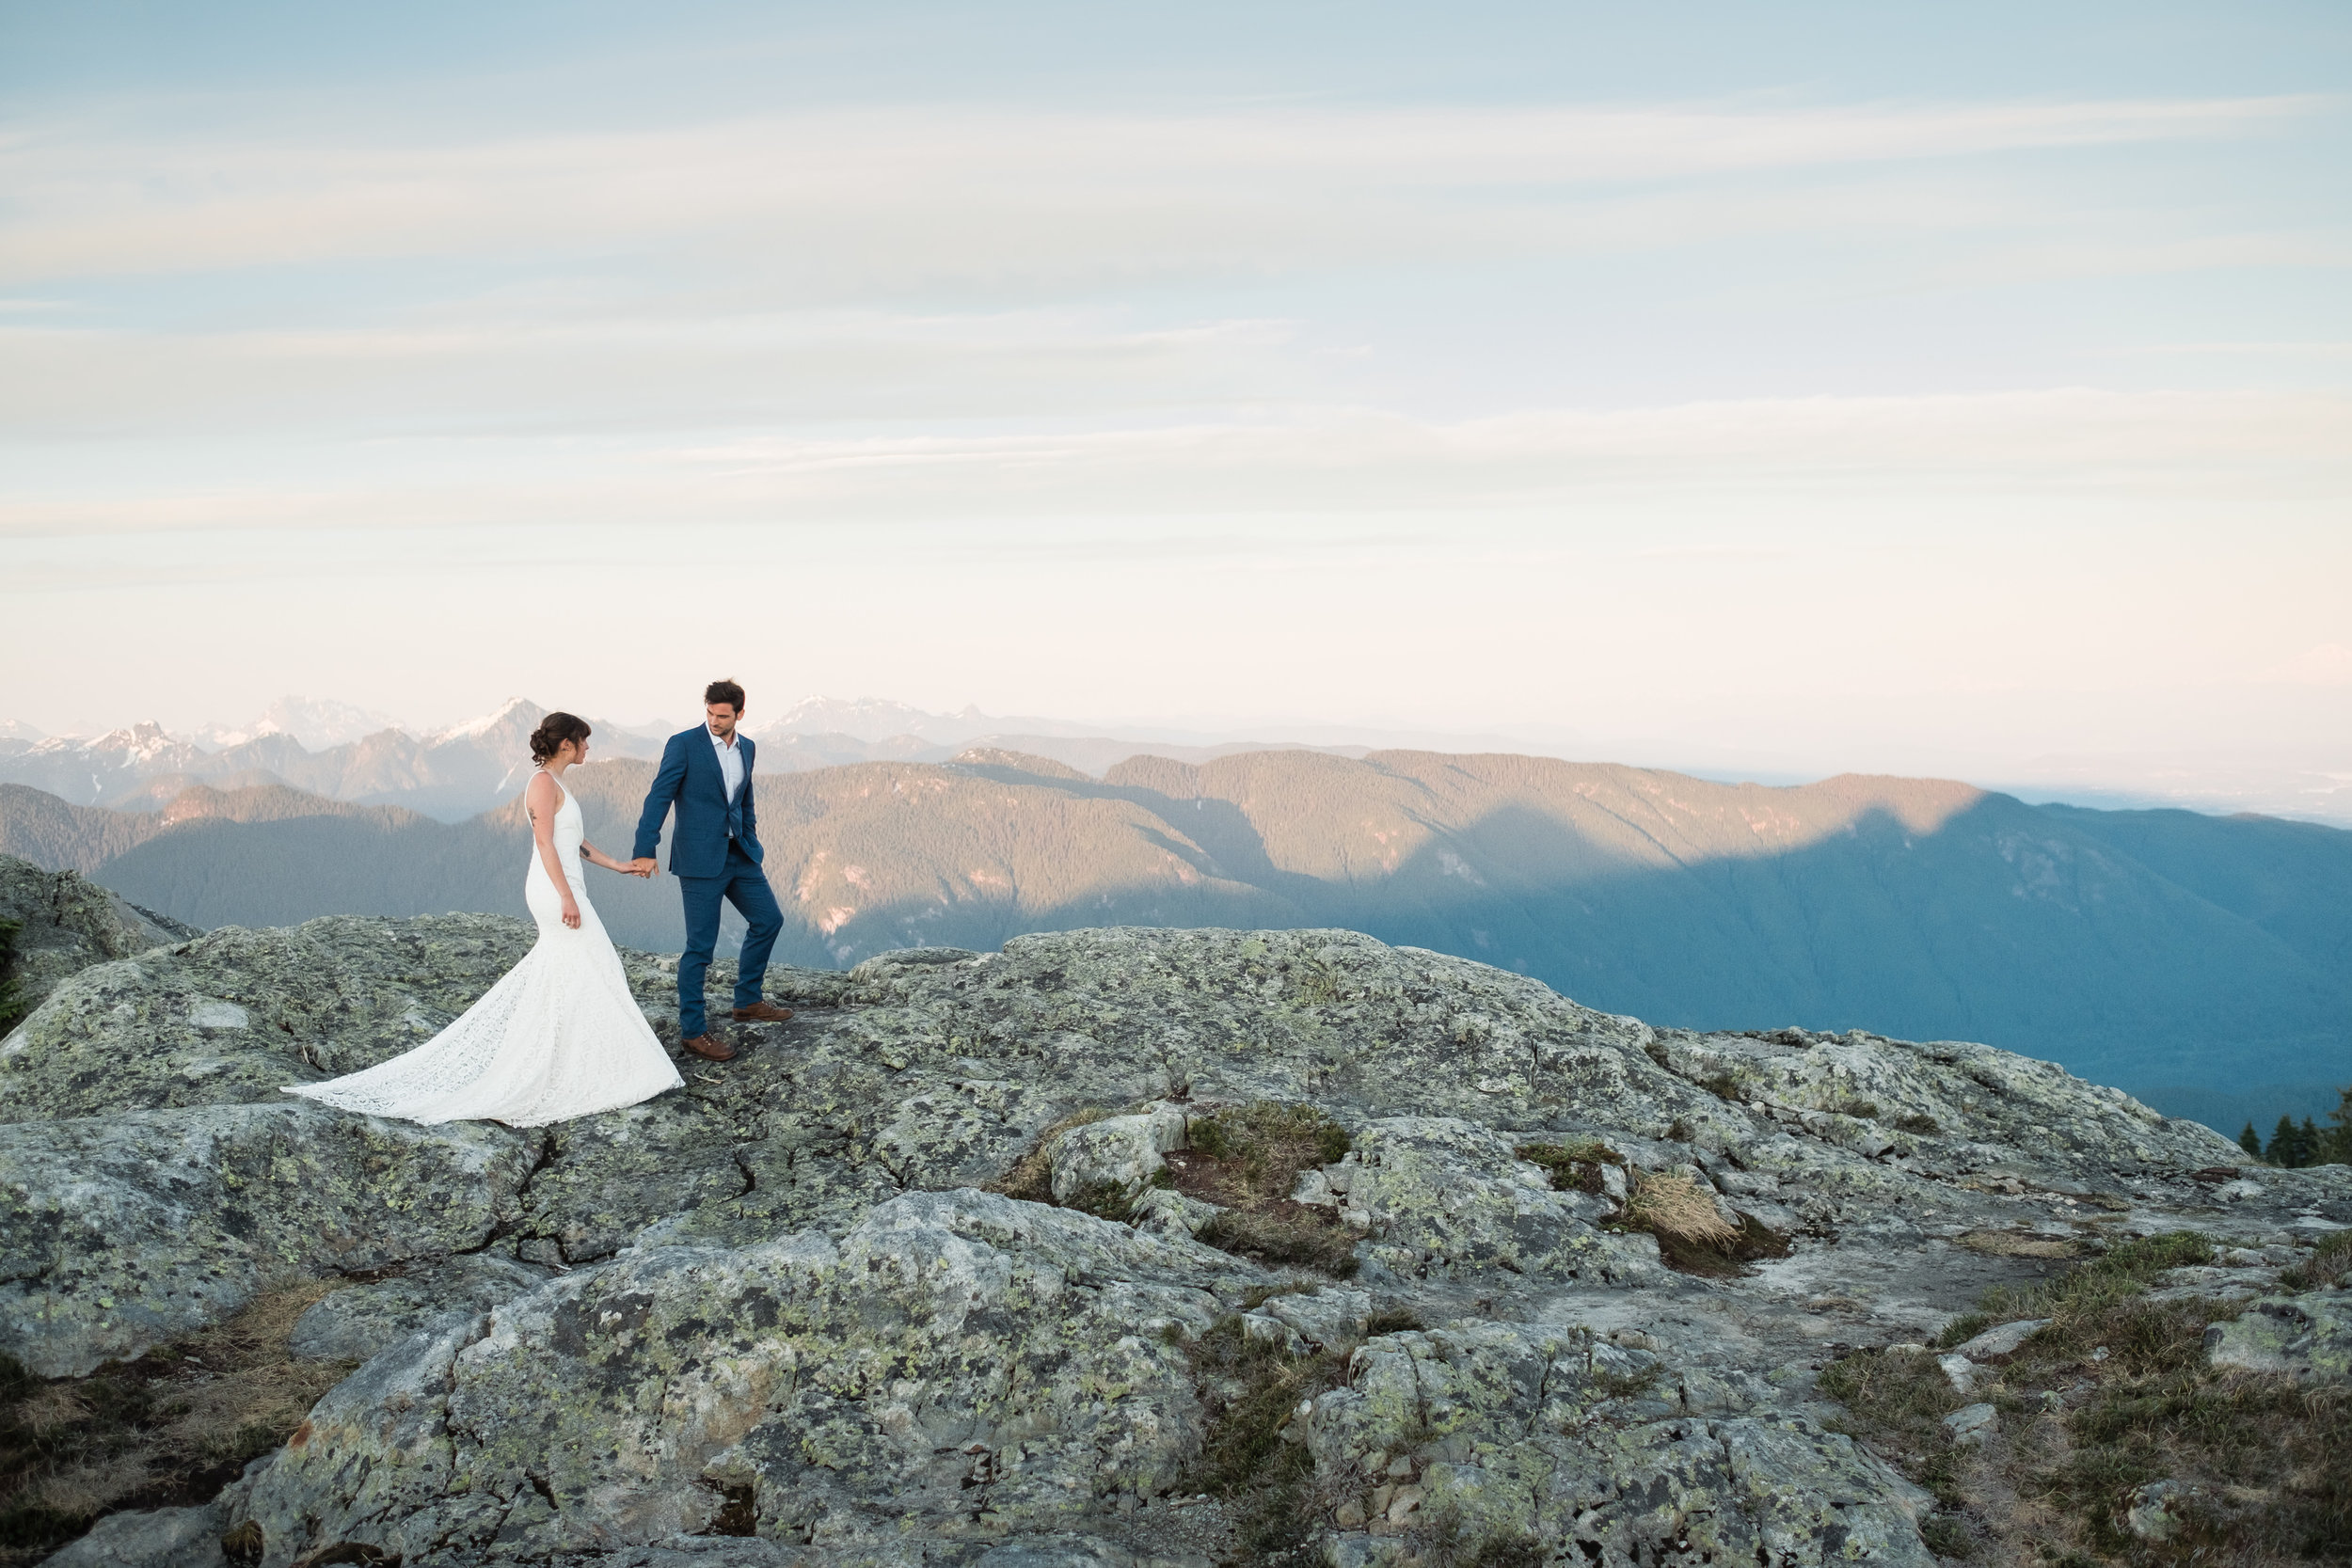 Mt-Seymour-styled-shoot-0072-jelger-tanja-photographers.jpg